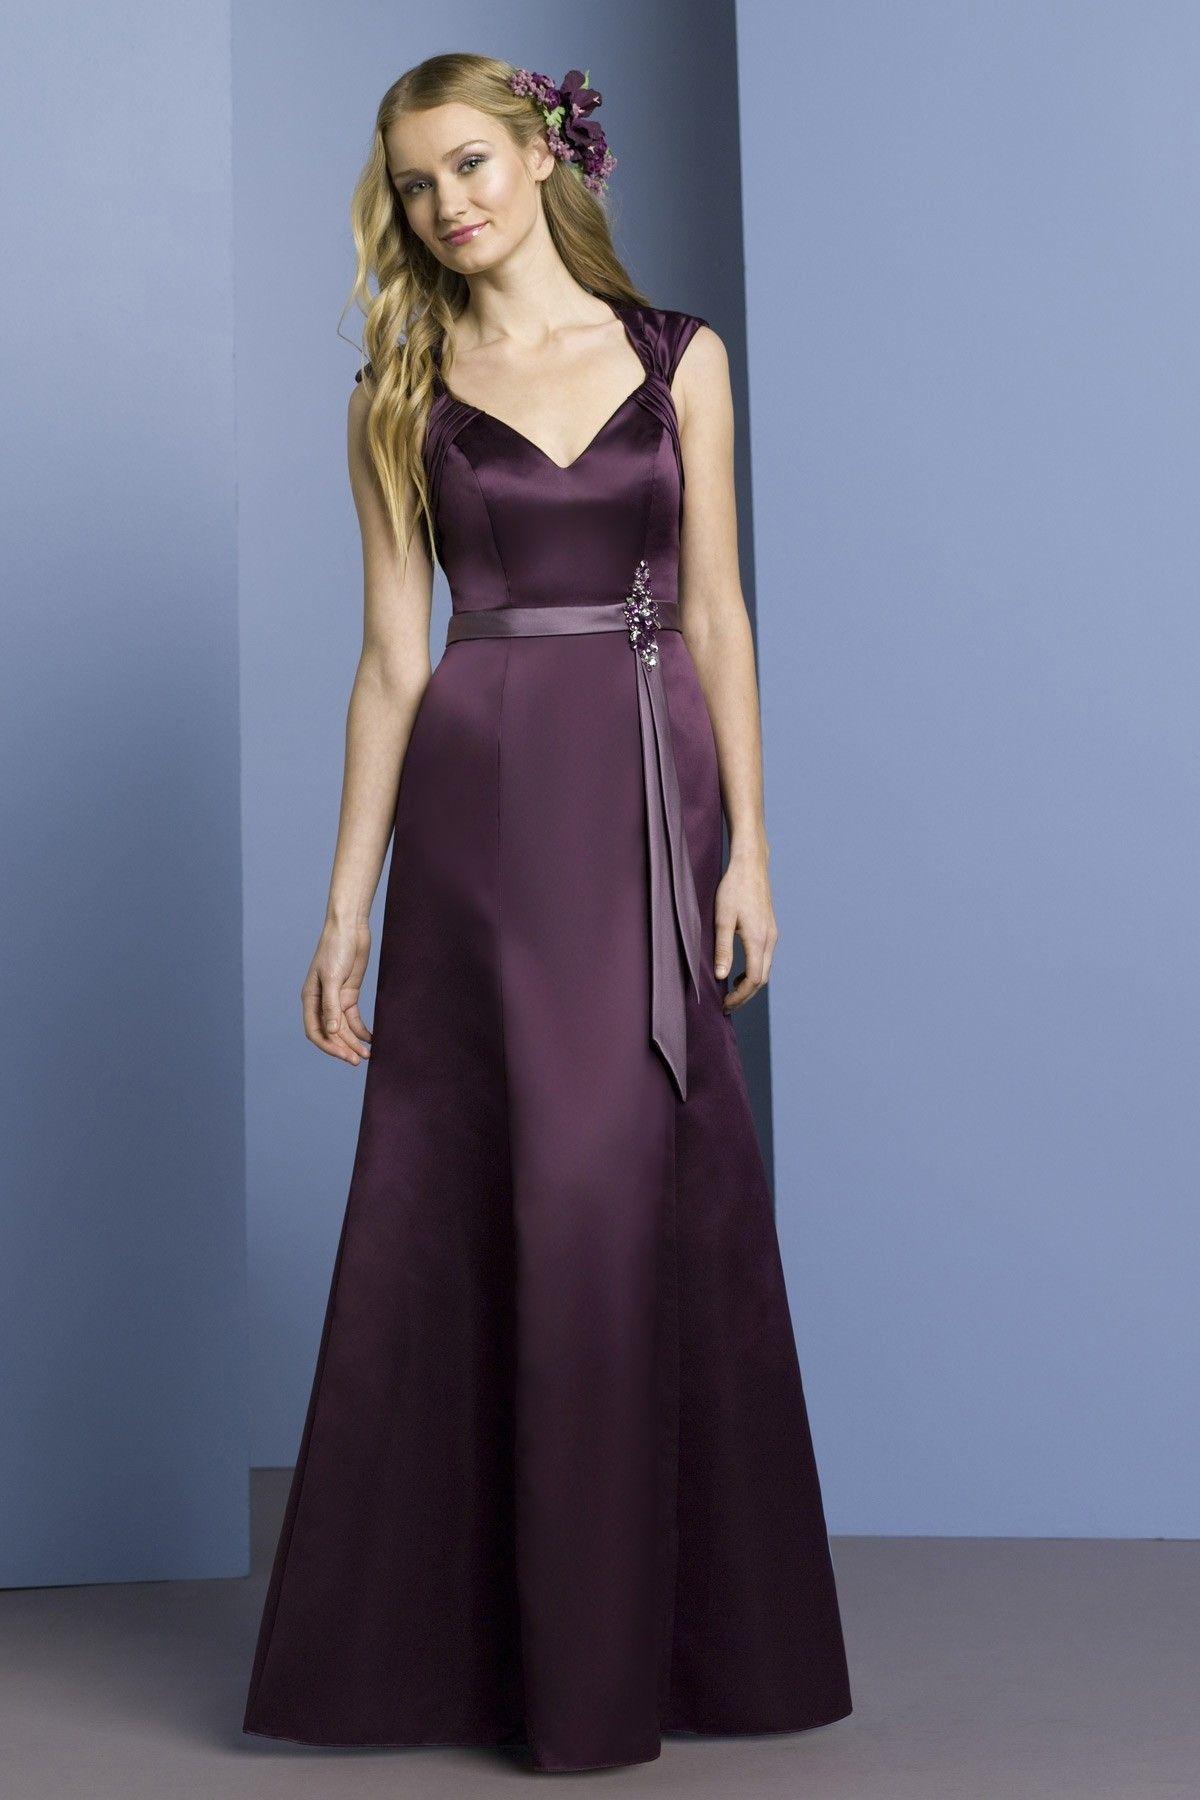 Satin V-neck Two-tone Available Long Prom Dress   Prom Dresses ...